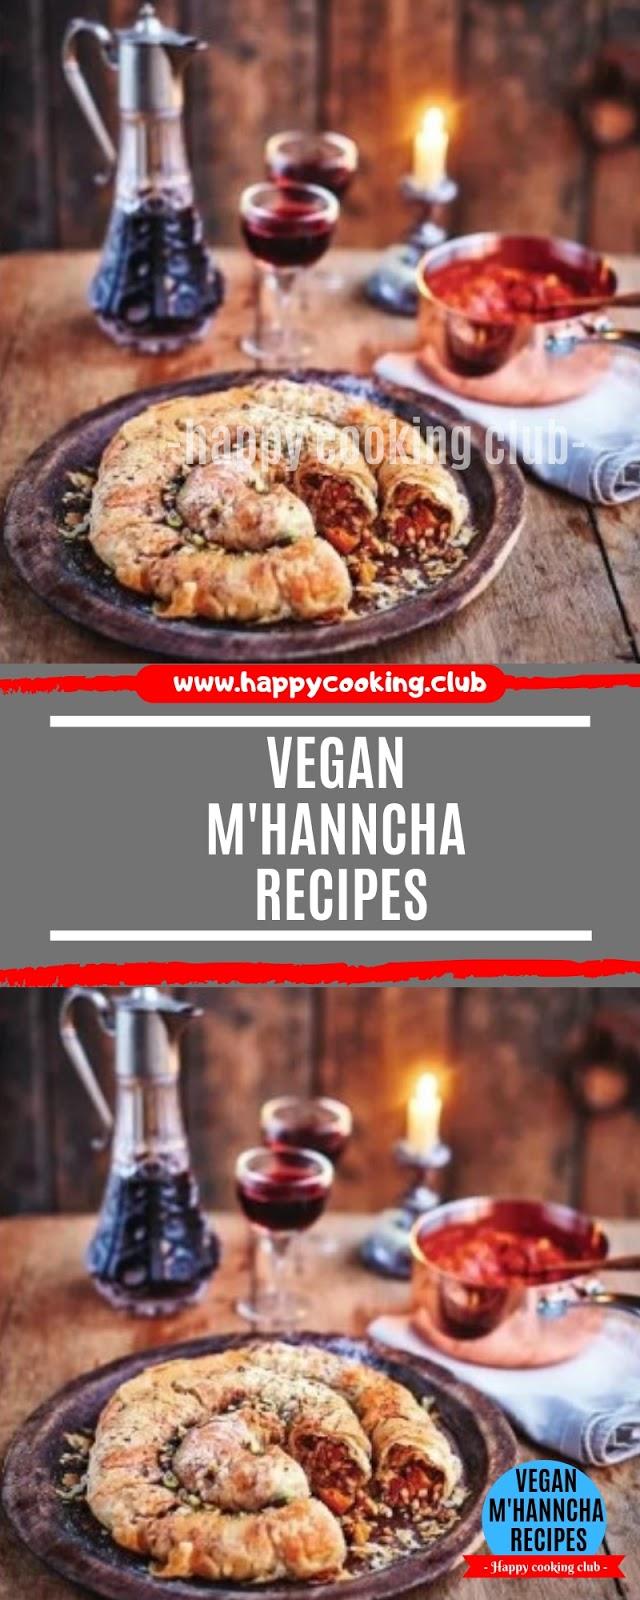 Vegan m'hanncha Recipes